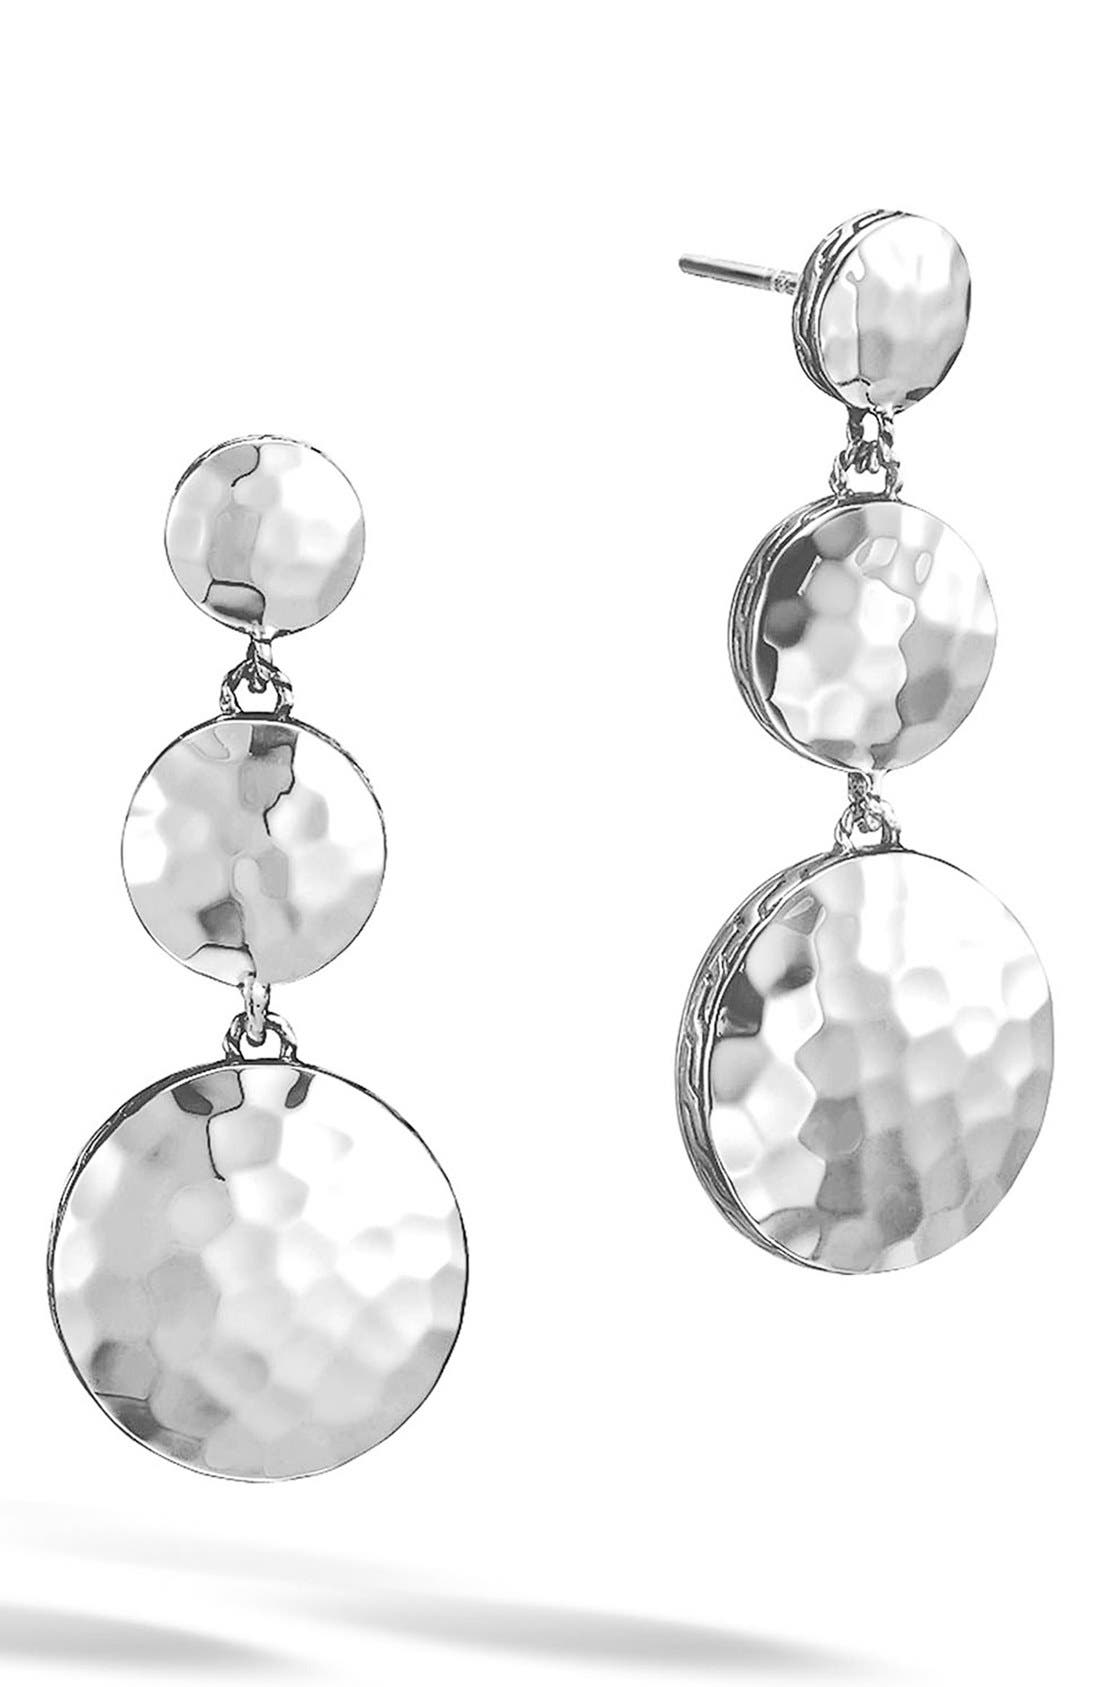 'Dot' Drop Earrings,                         Main,                         color, Silver